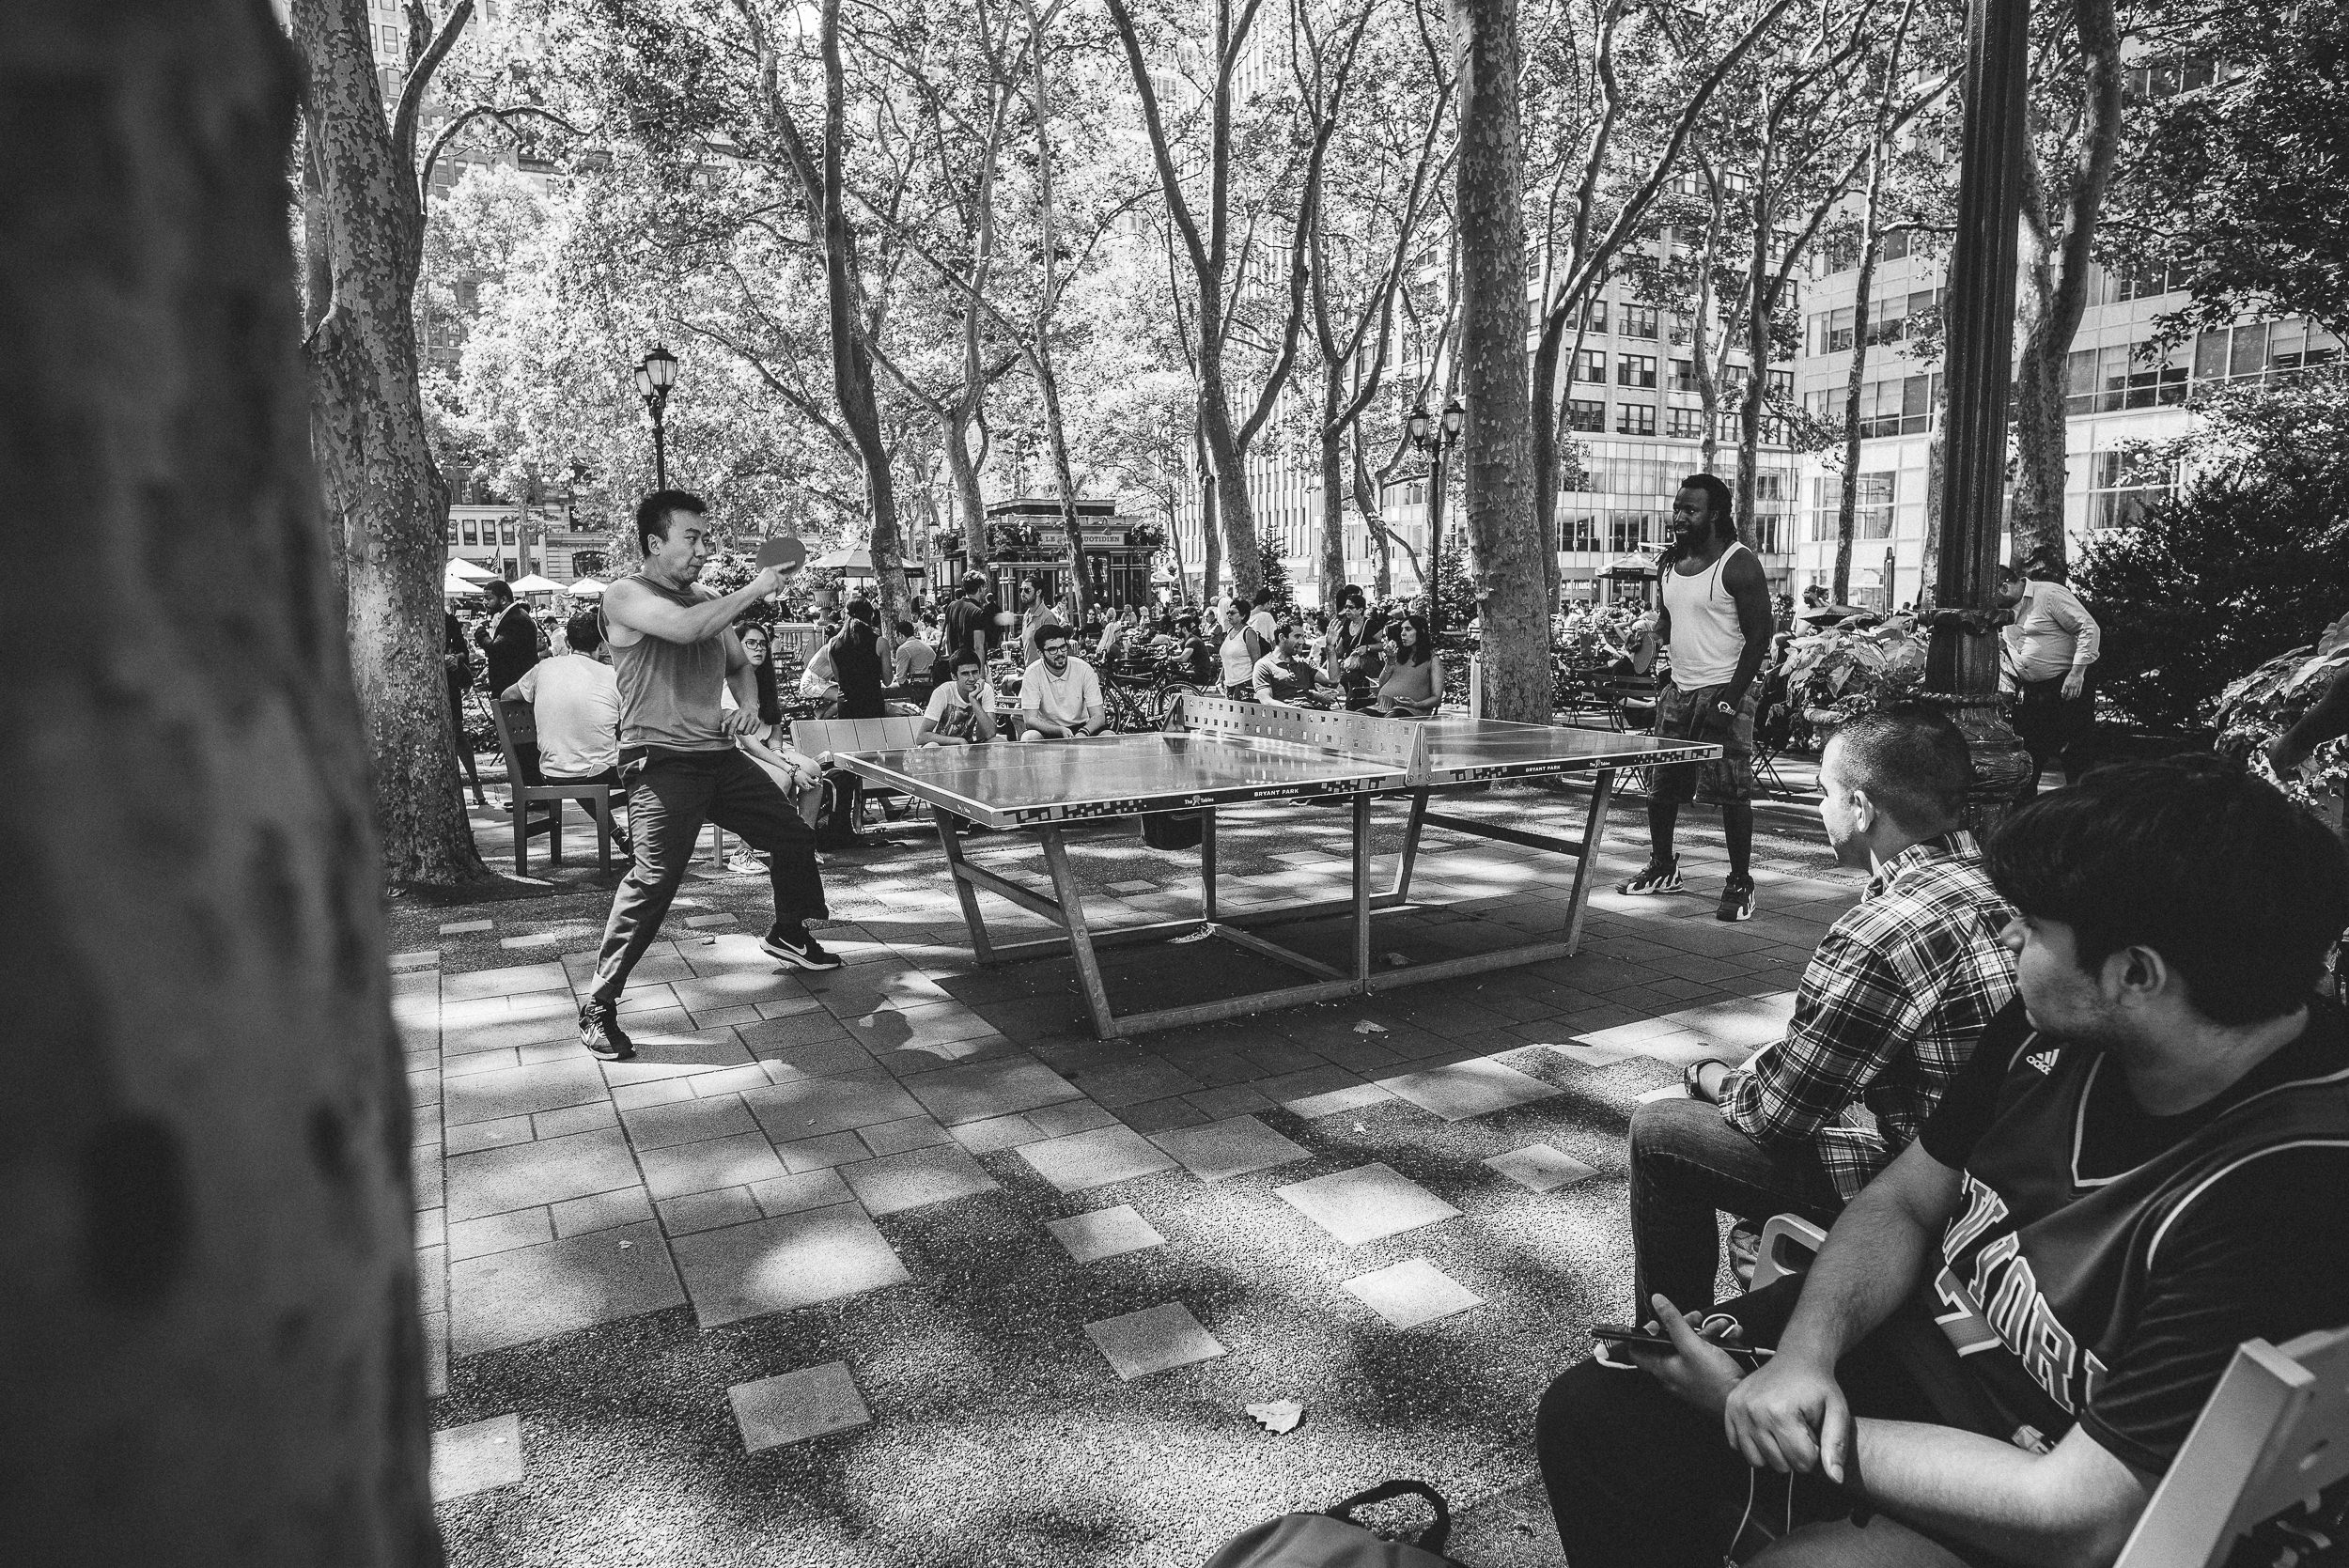 New-York-City-Travel-Photography-039.jpg